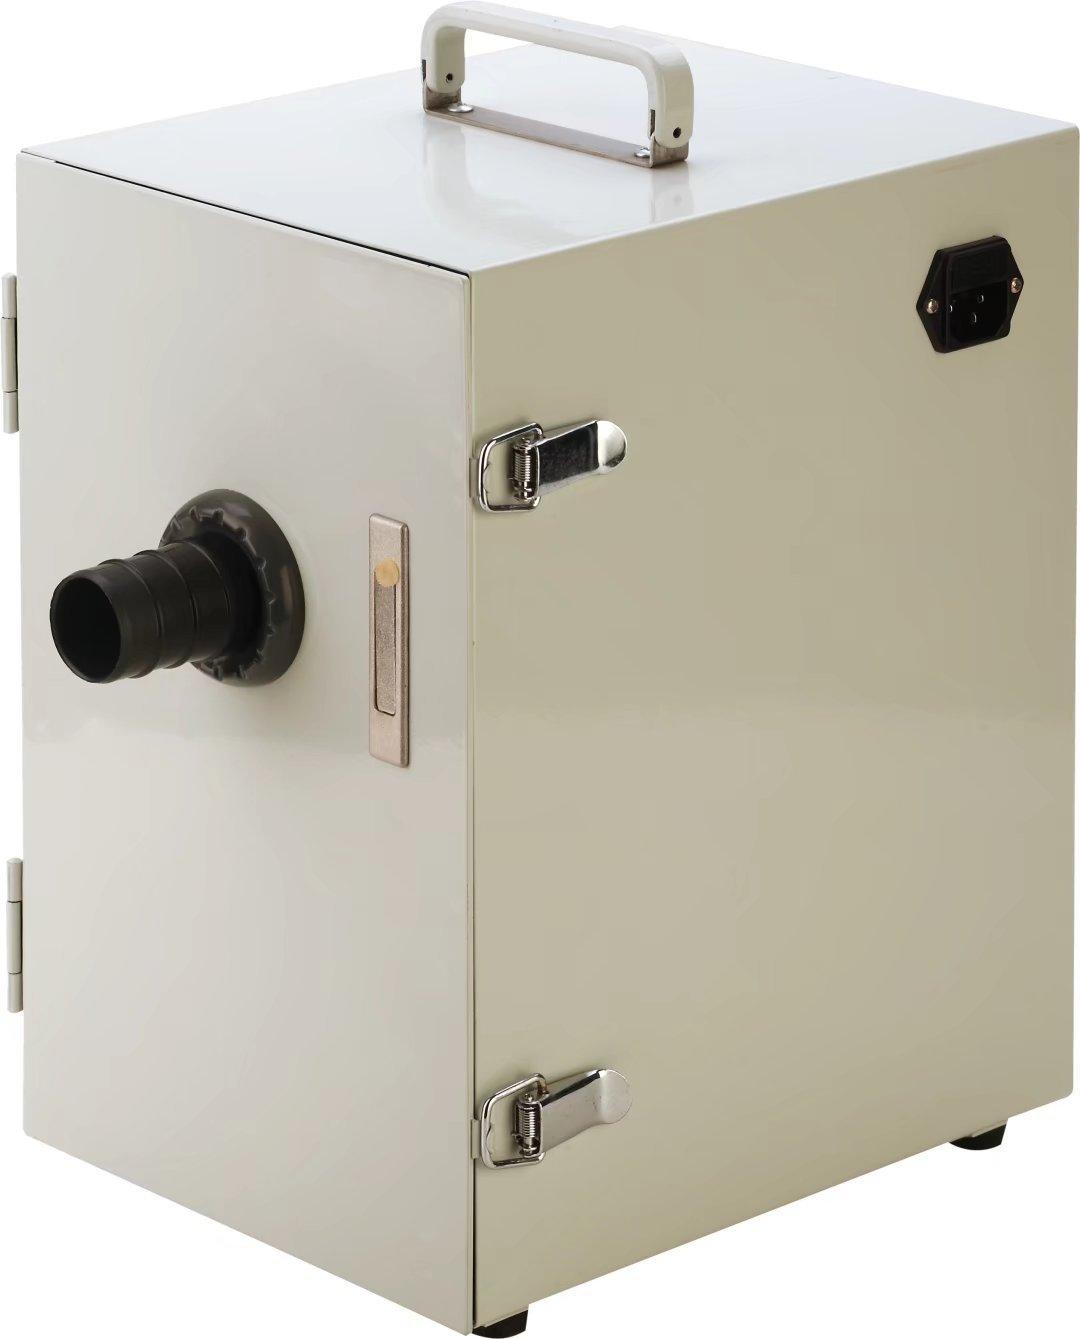 Romantic桜 JT-26Cダストコレクター 小型静音集塵機 デジタル表示 B076D3P1DW